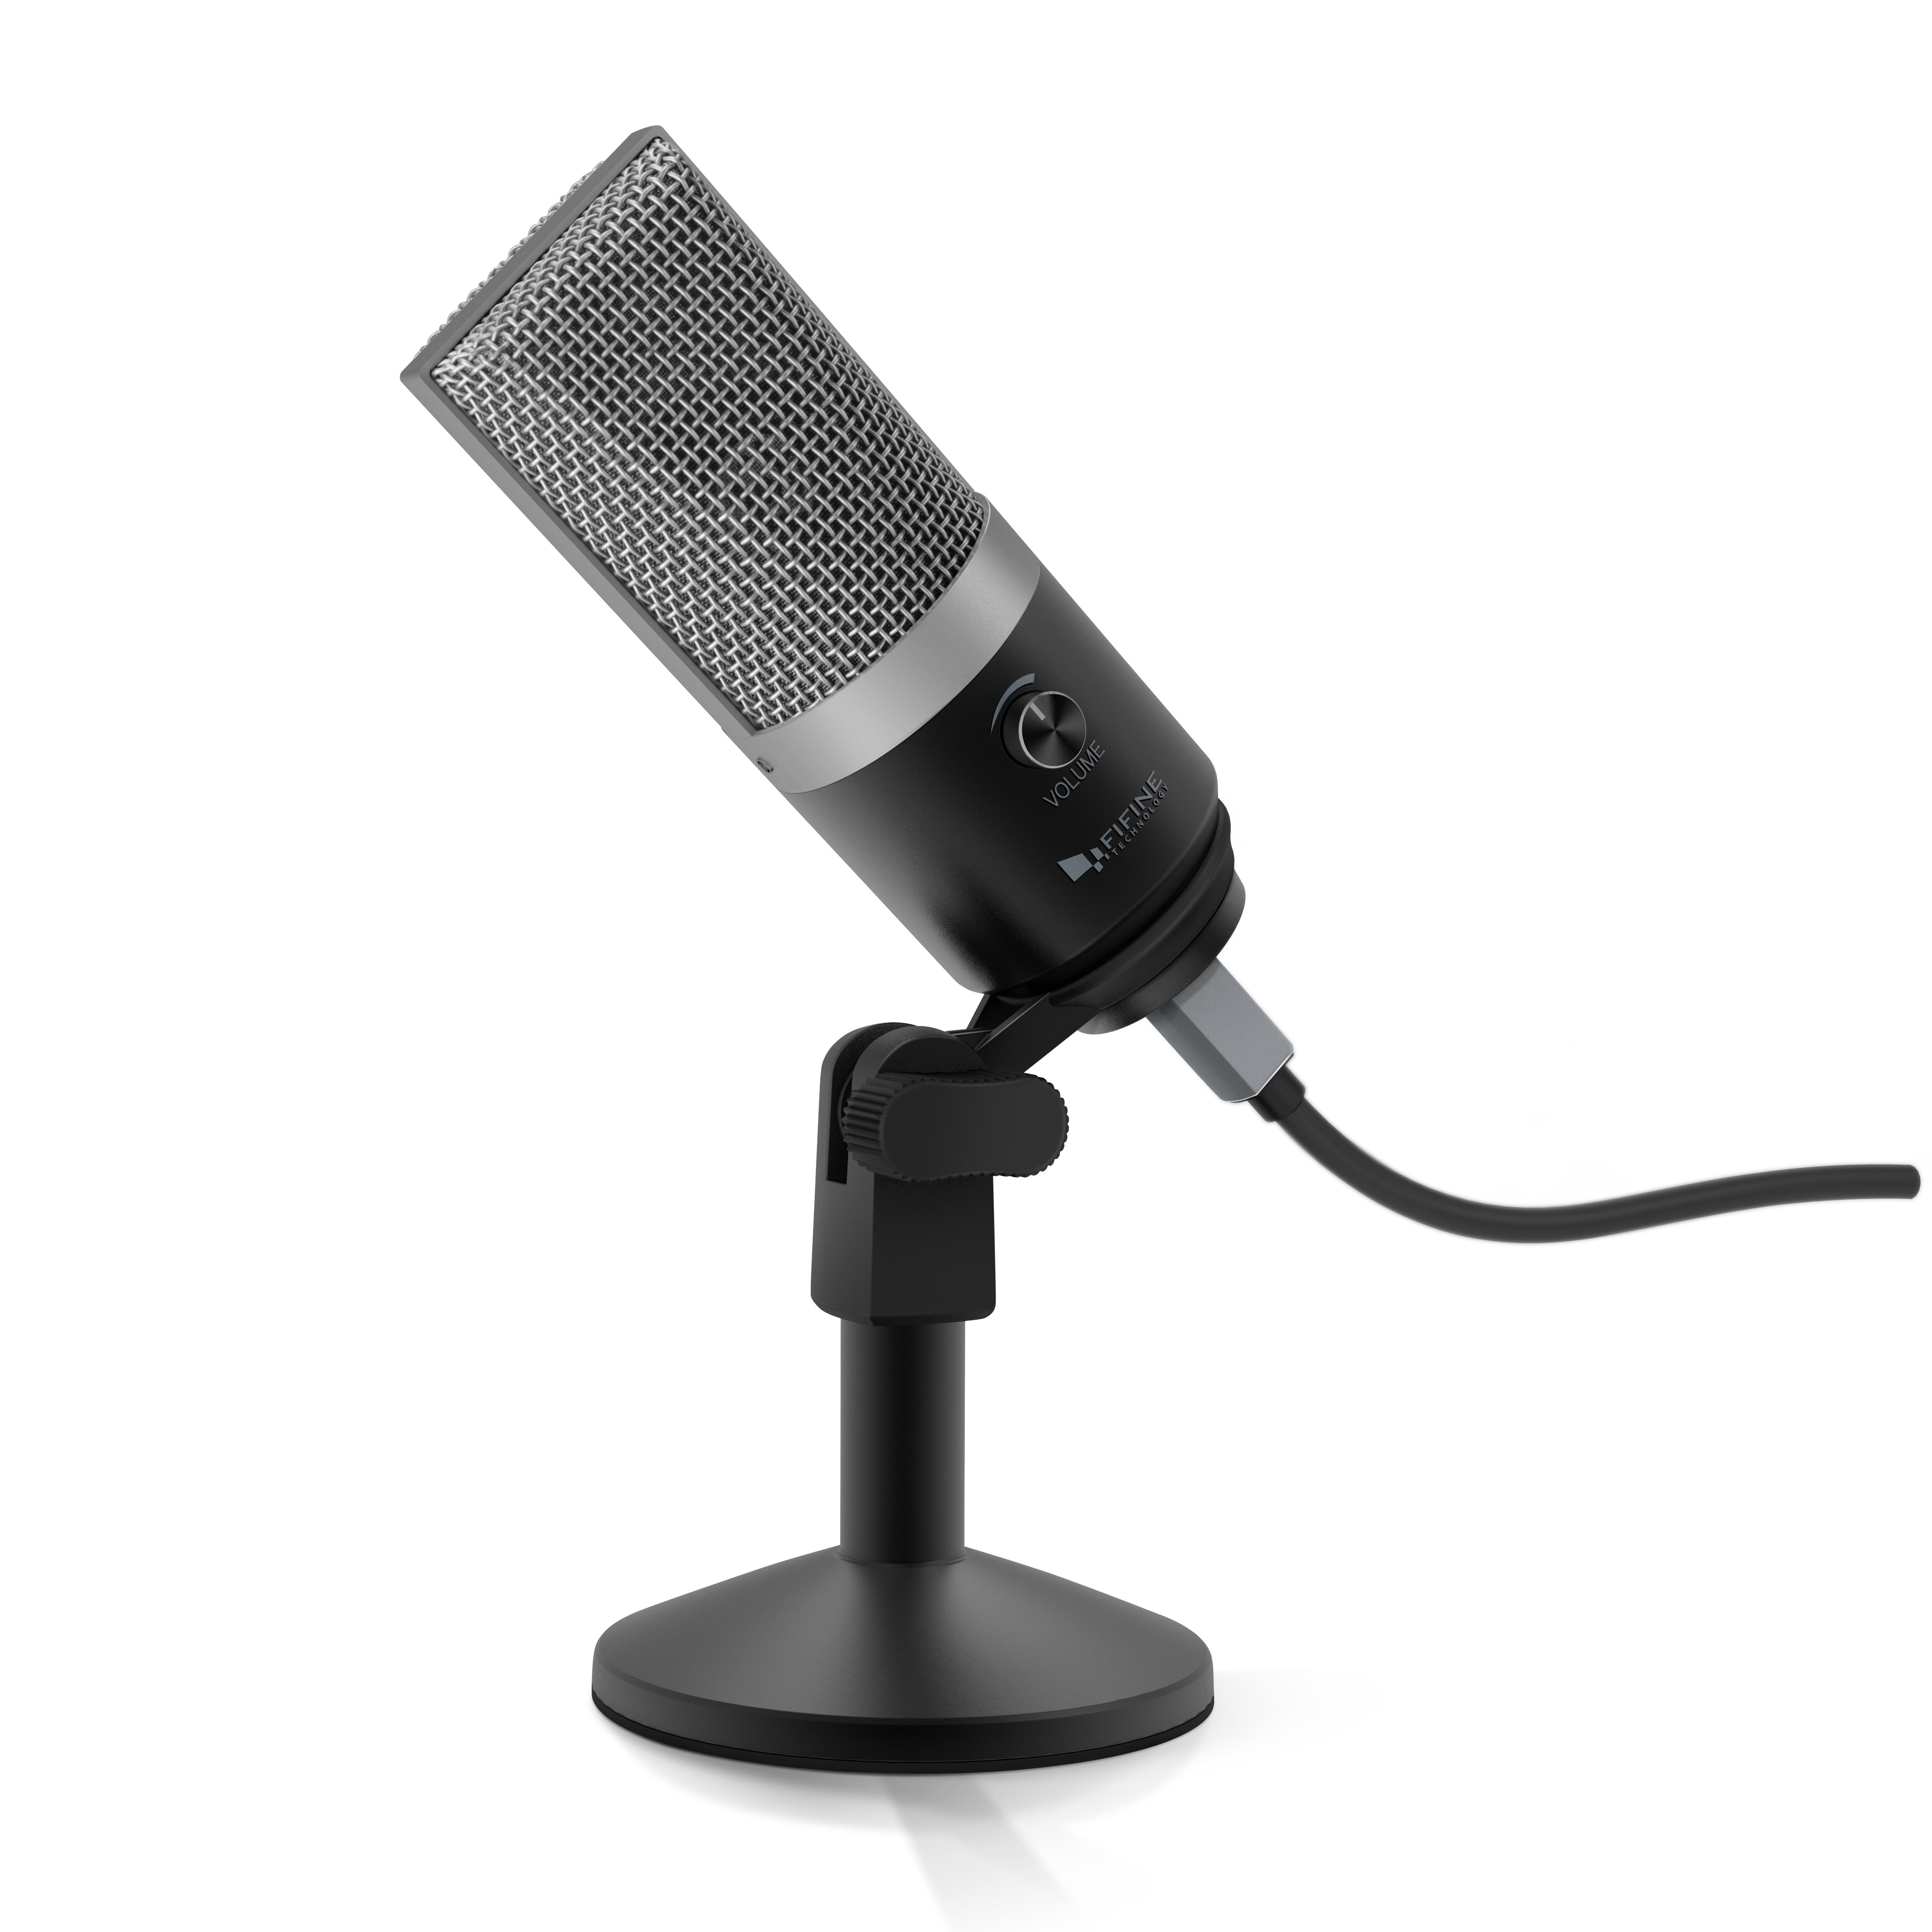 FIFINE USB ميكروفون للنوافذ الكمبيوتر و ماك المهنية تسجيل المكثف MIC ل يوتيوب سكايب اجتماع لعبة K670